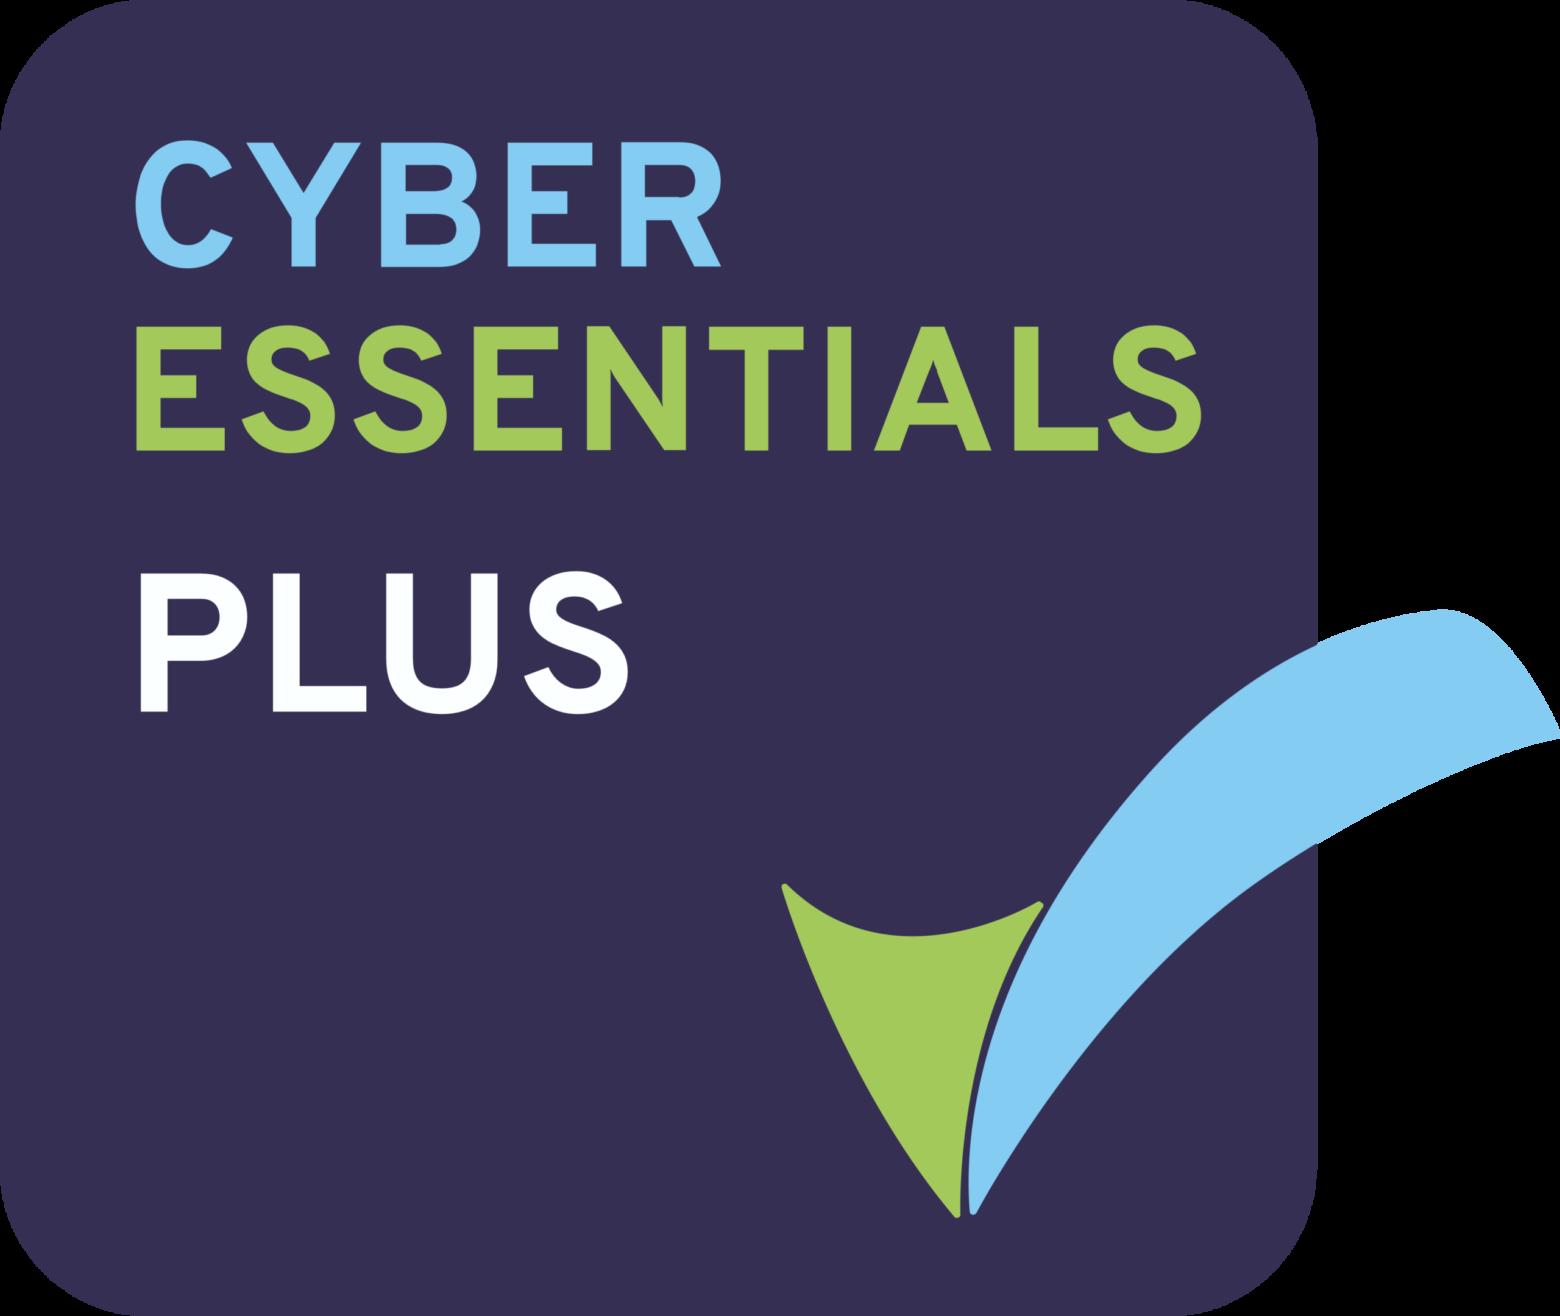 Digital Asset Management receives its Cyber Essentials PLUS certification